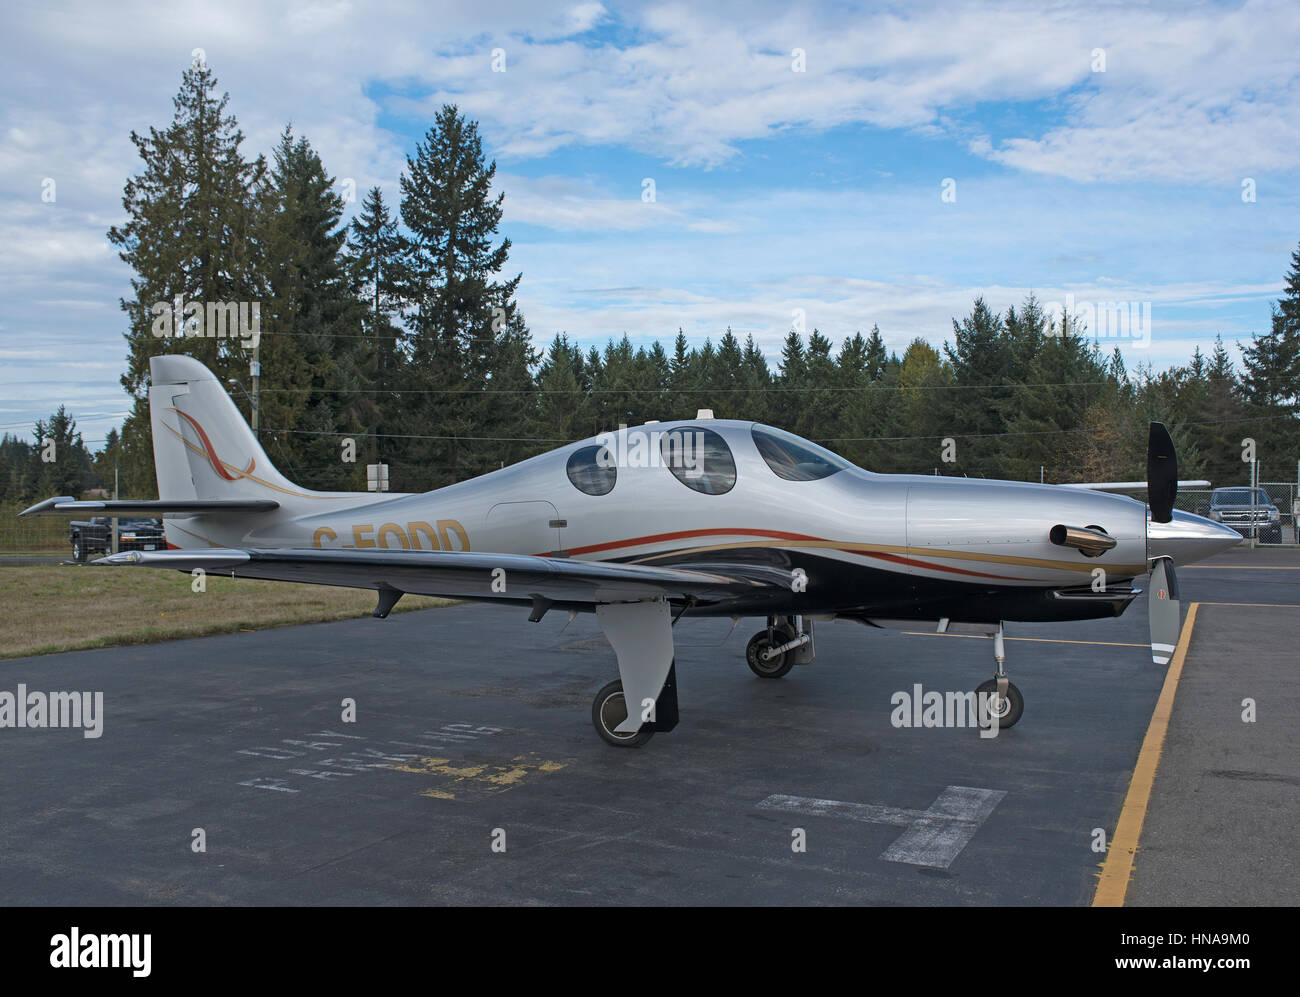 Lancer Evolution piston engined private civil aircraft serial registration C-FODD. - Stock Image